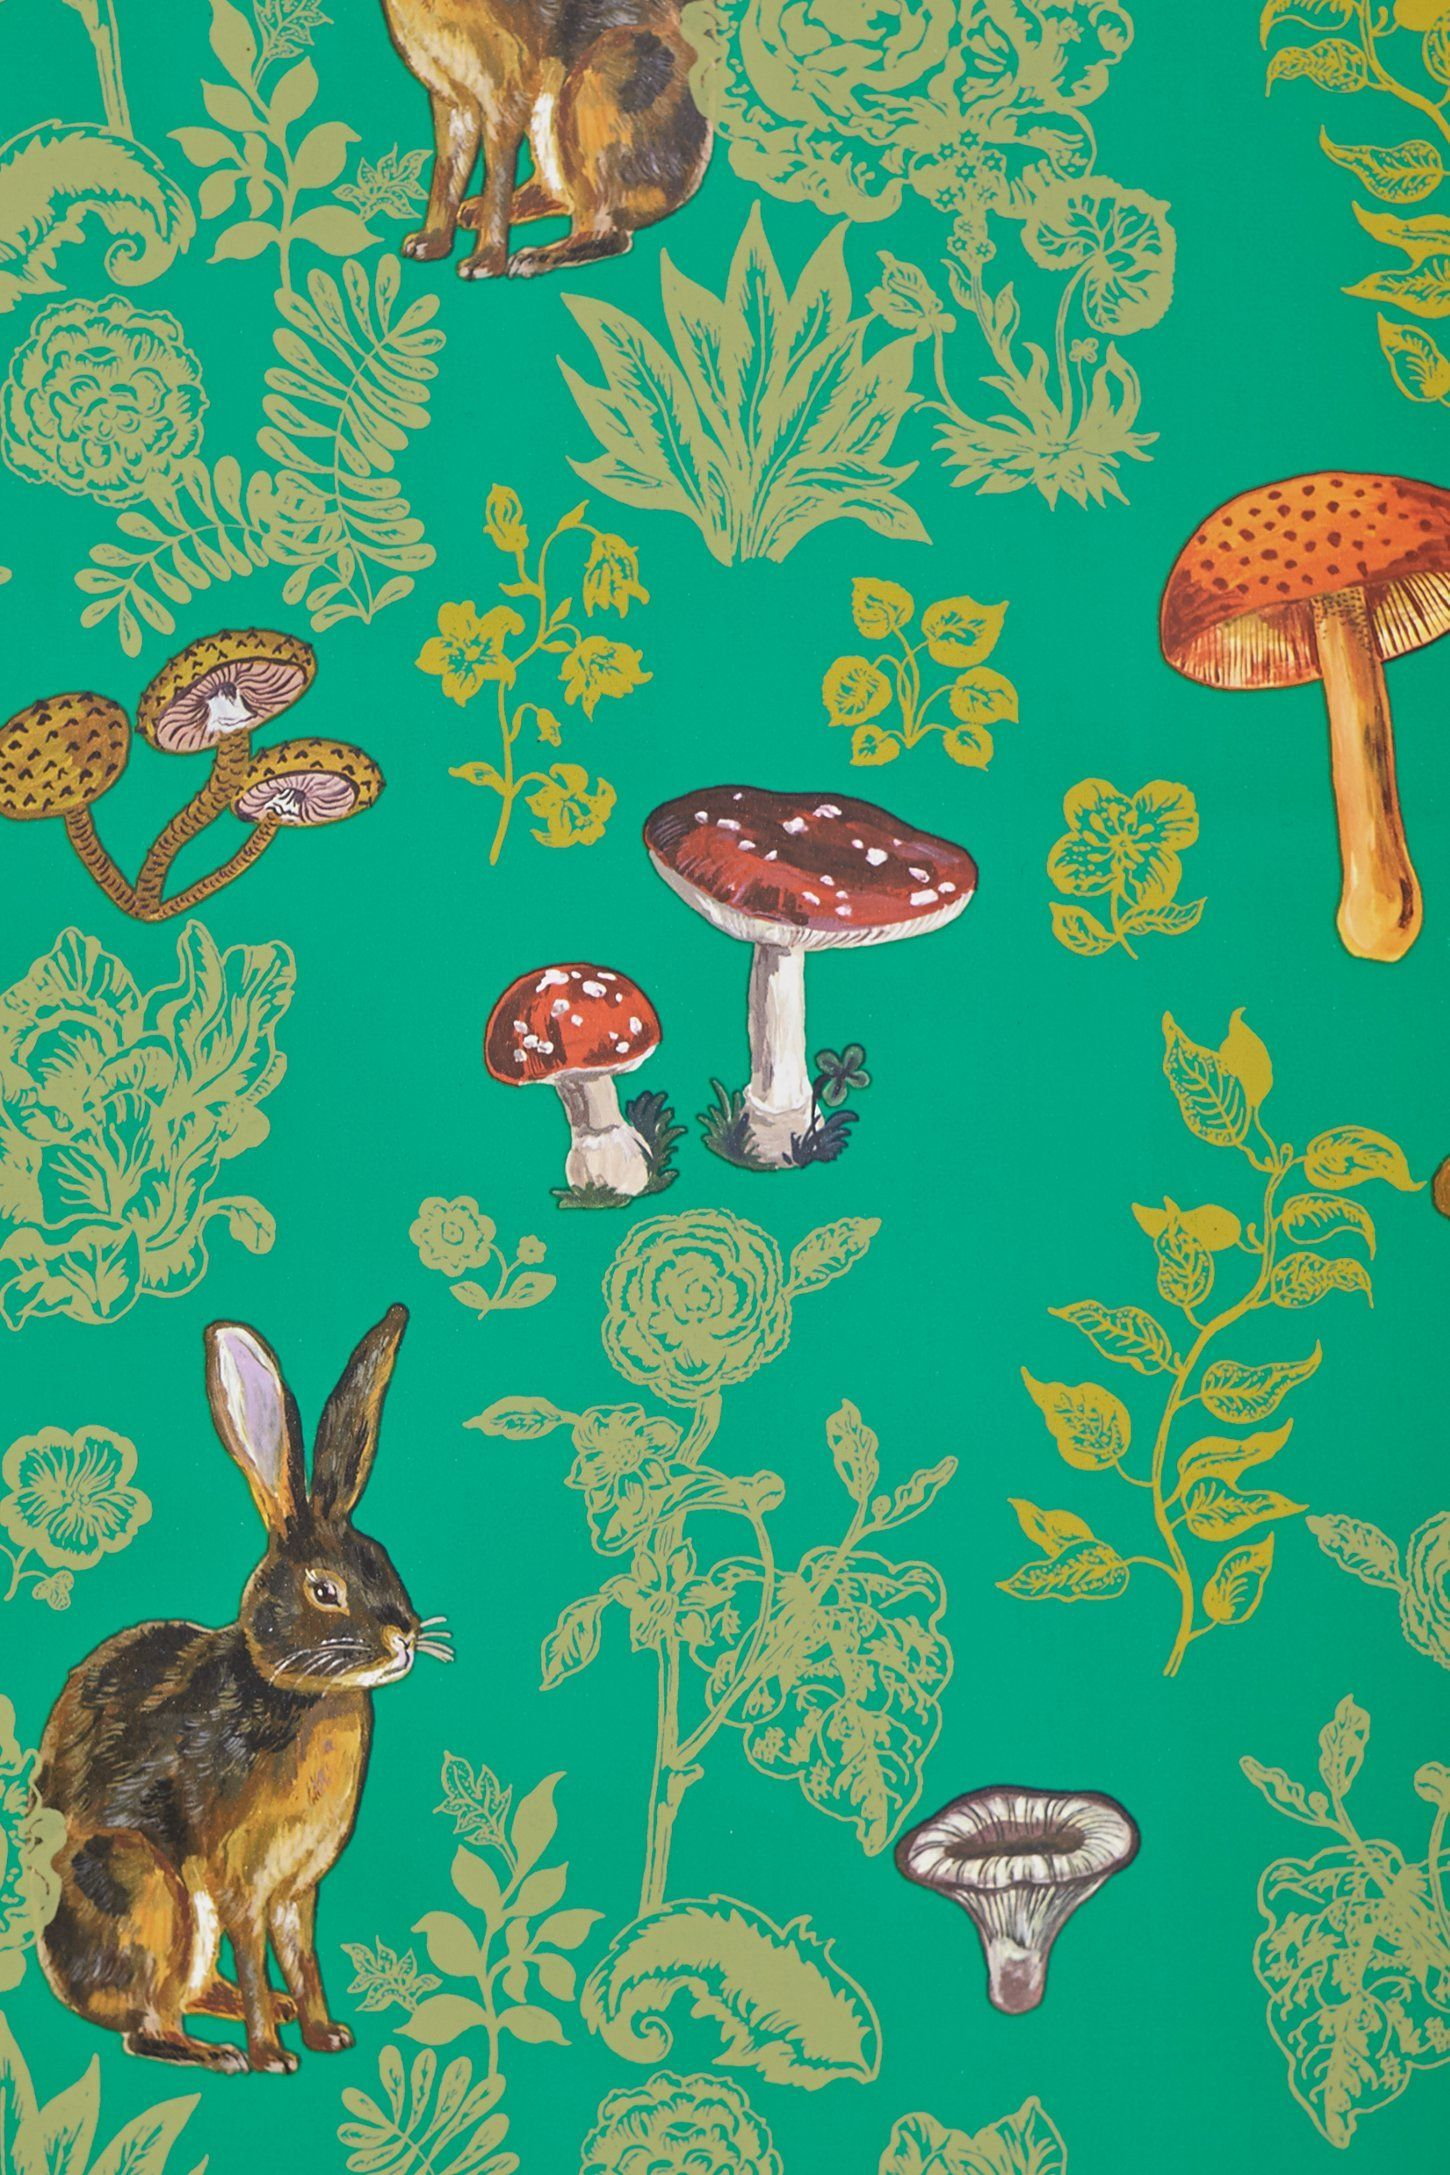 Mushroomforest Wallpaper Anthropologie Wallpapers Phone